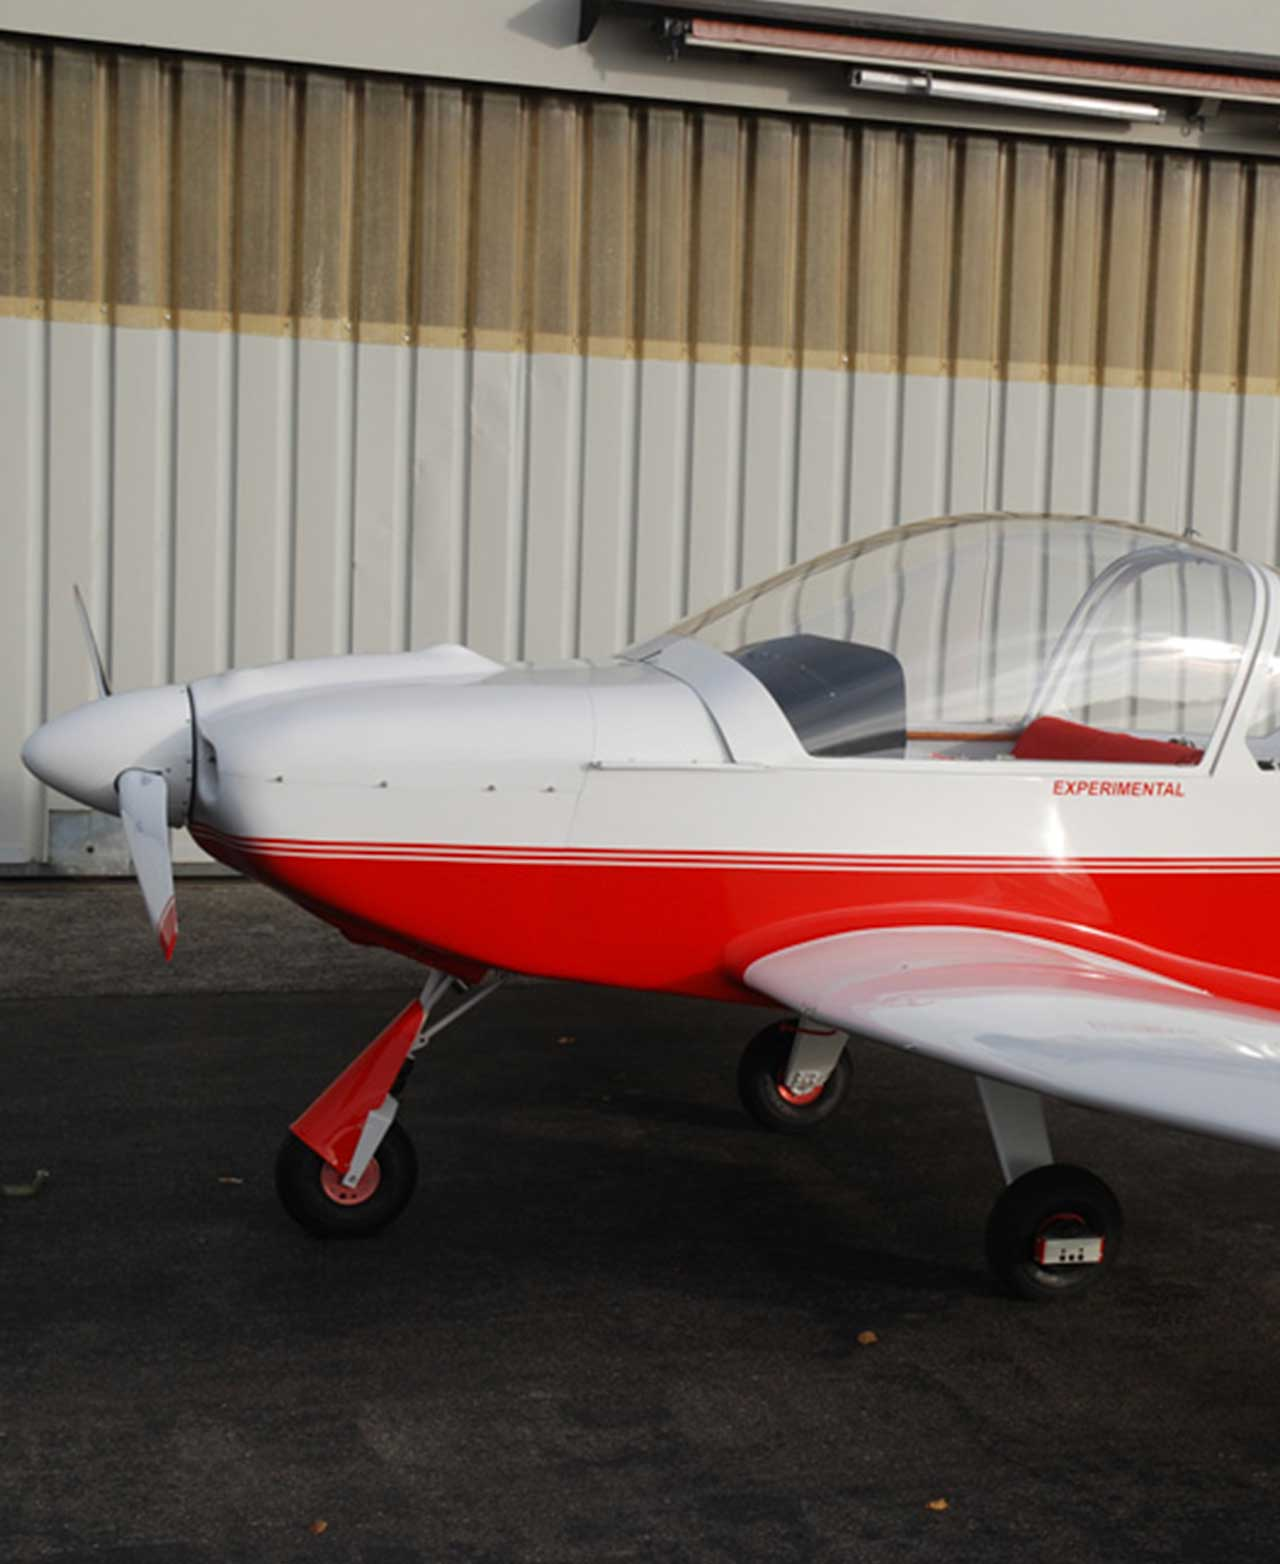 Experimental Plane